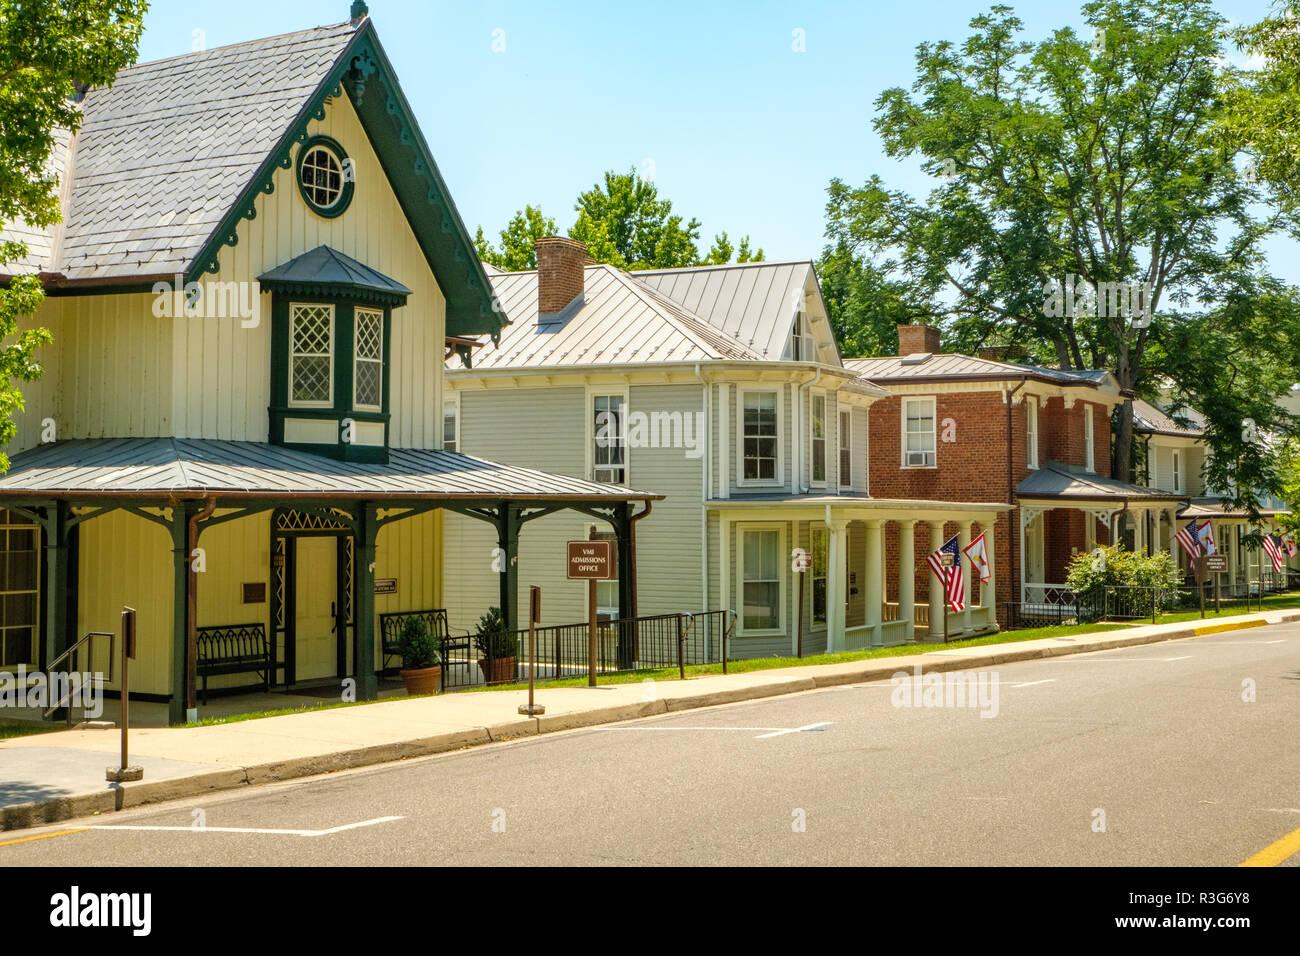 622dfabb4f75 VMI Admissions office, Pendleton-Coles House, Virginia Military Institute,  Lexington, Virginia